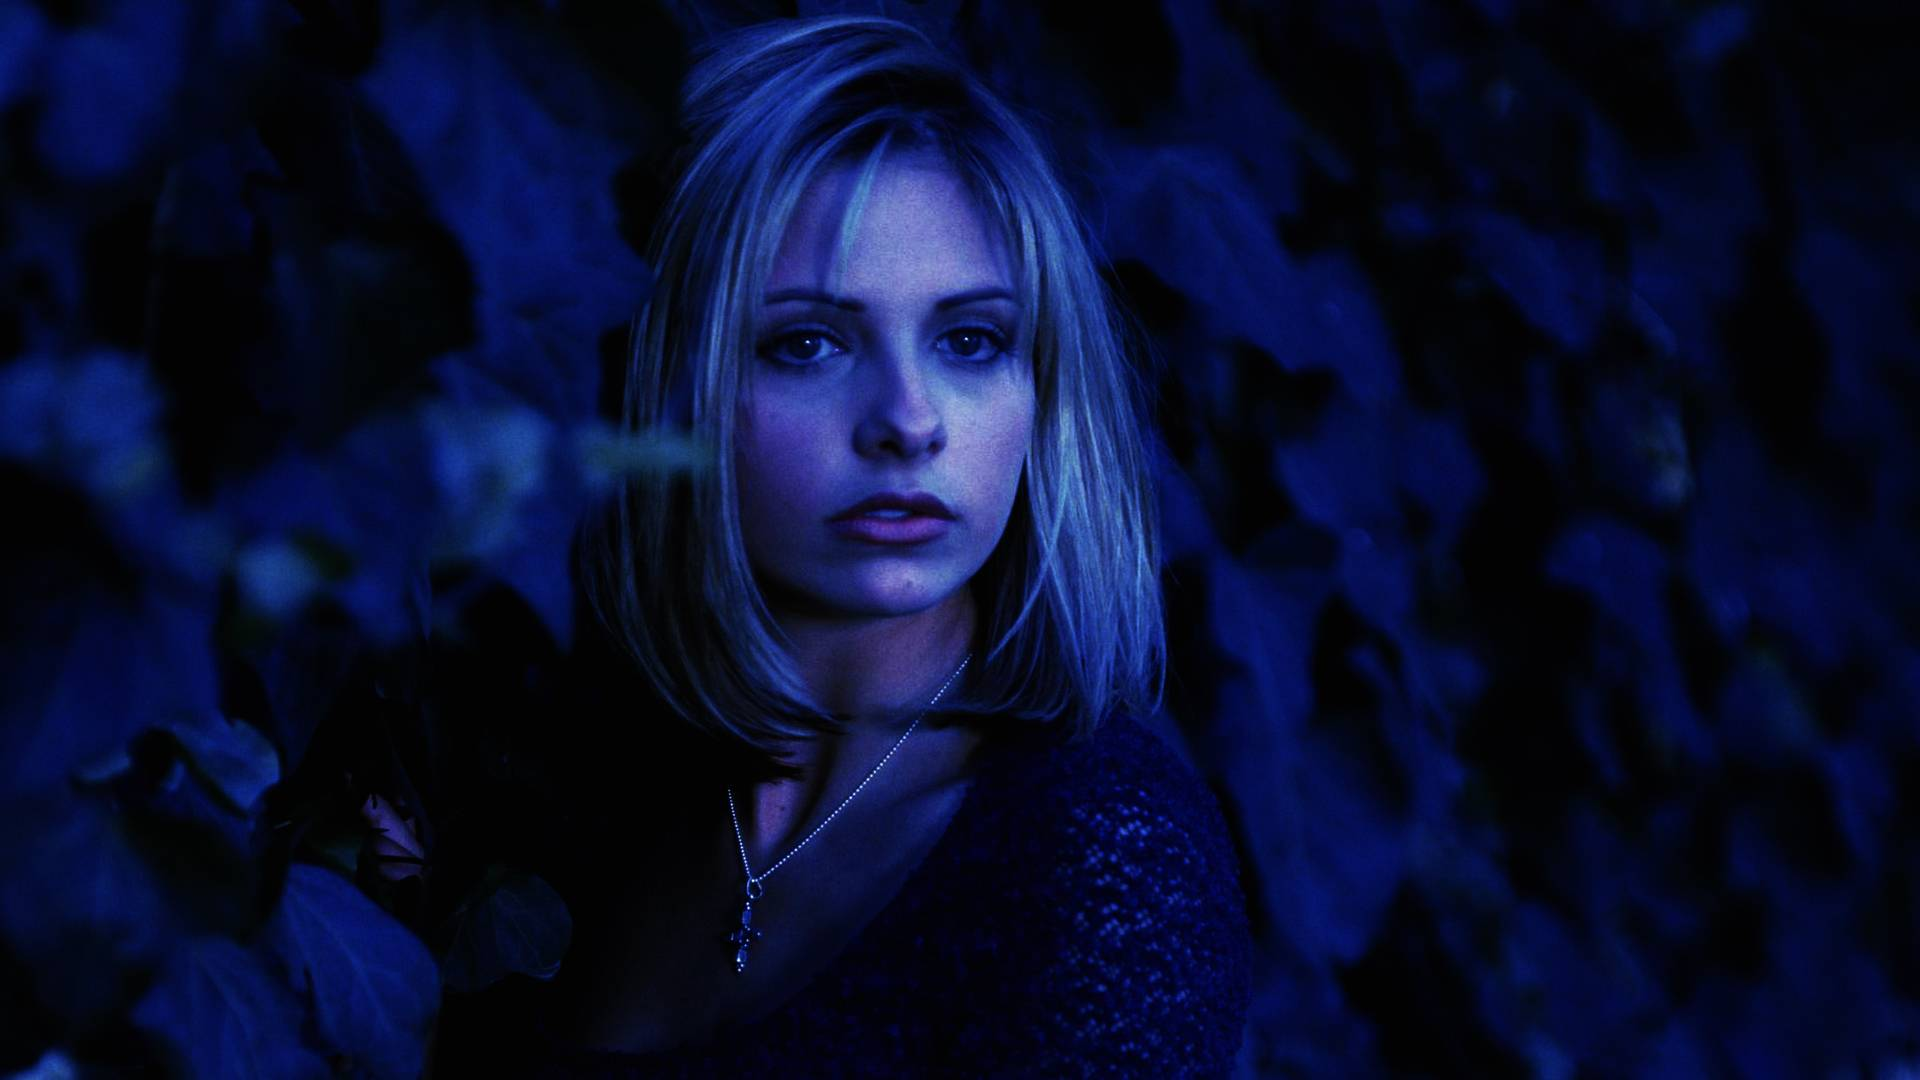 Free Download Buffy The Vampire Slayer Buffy The Vampire Slayer